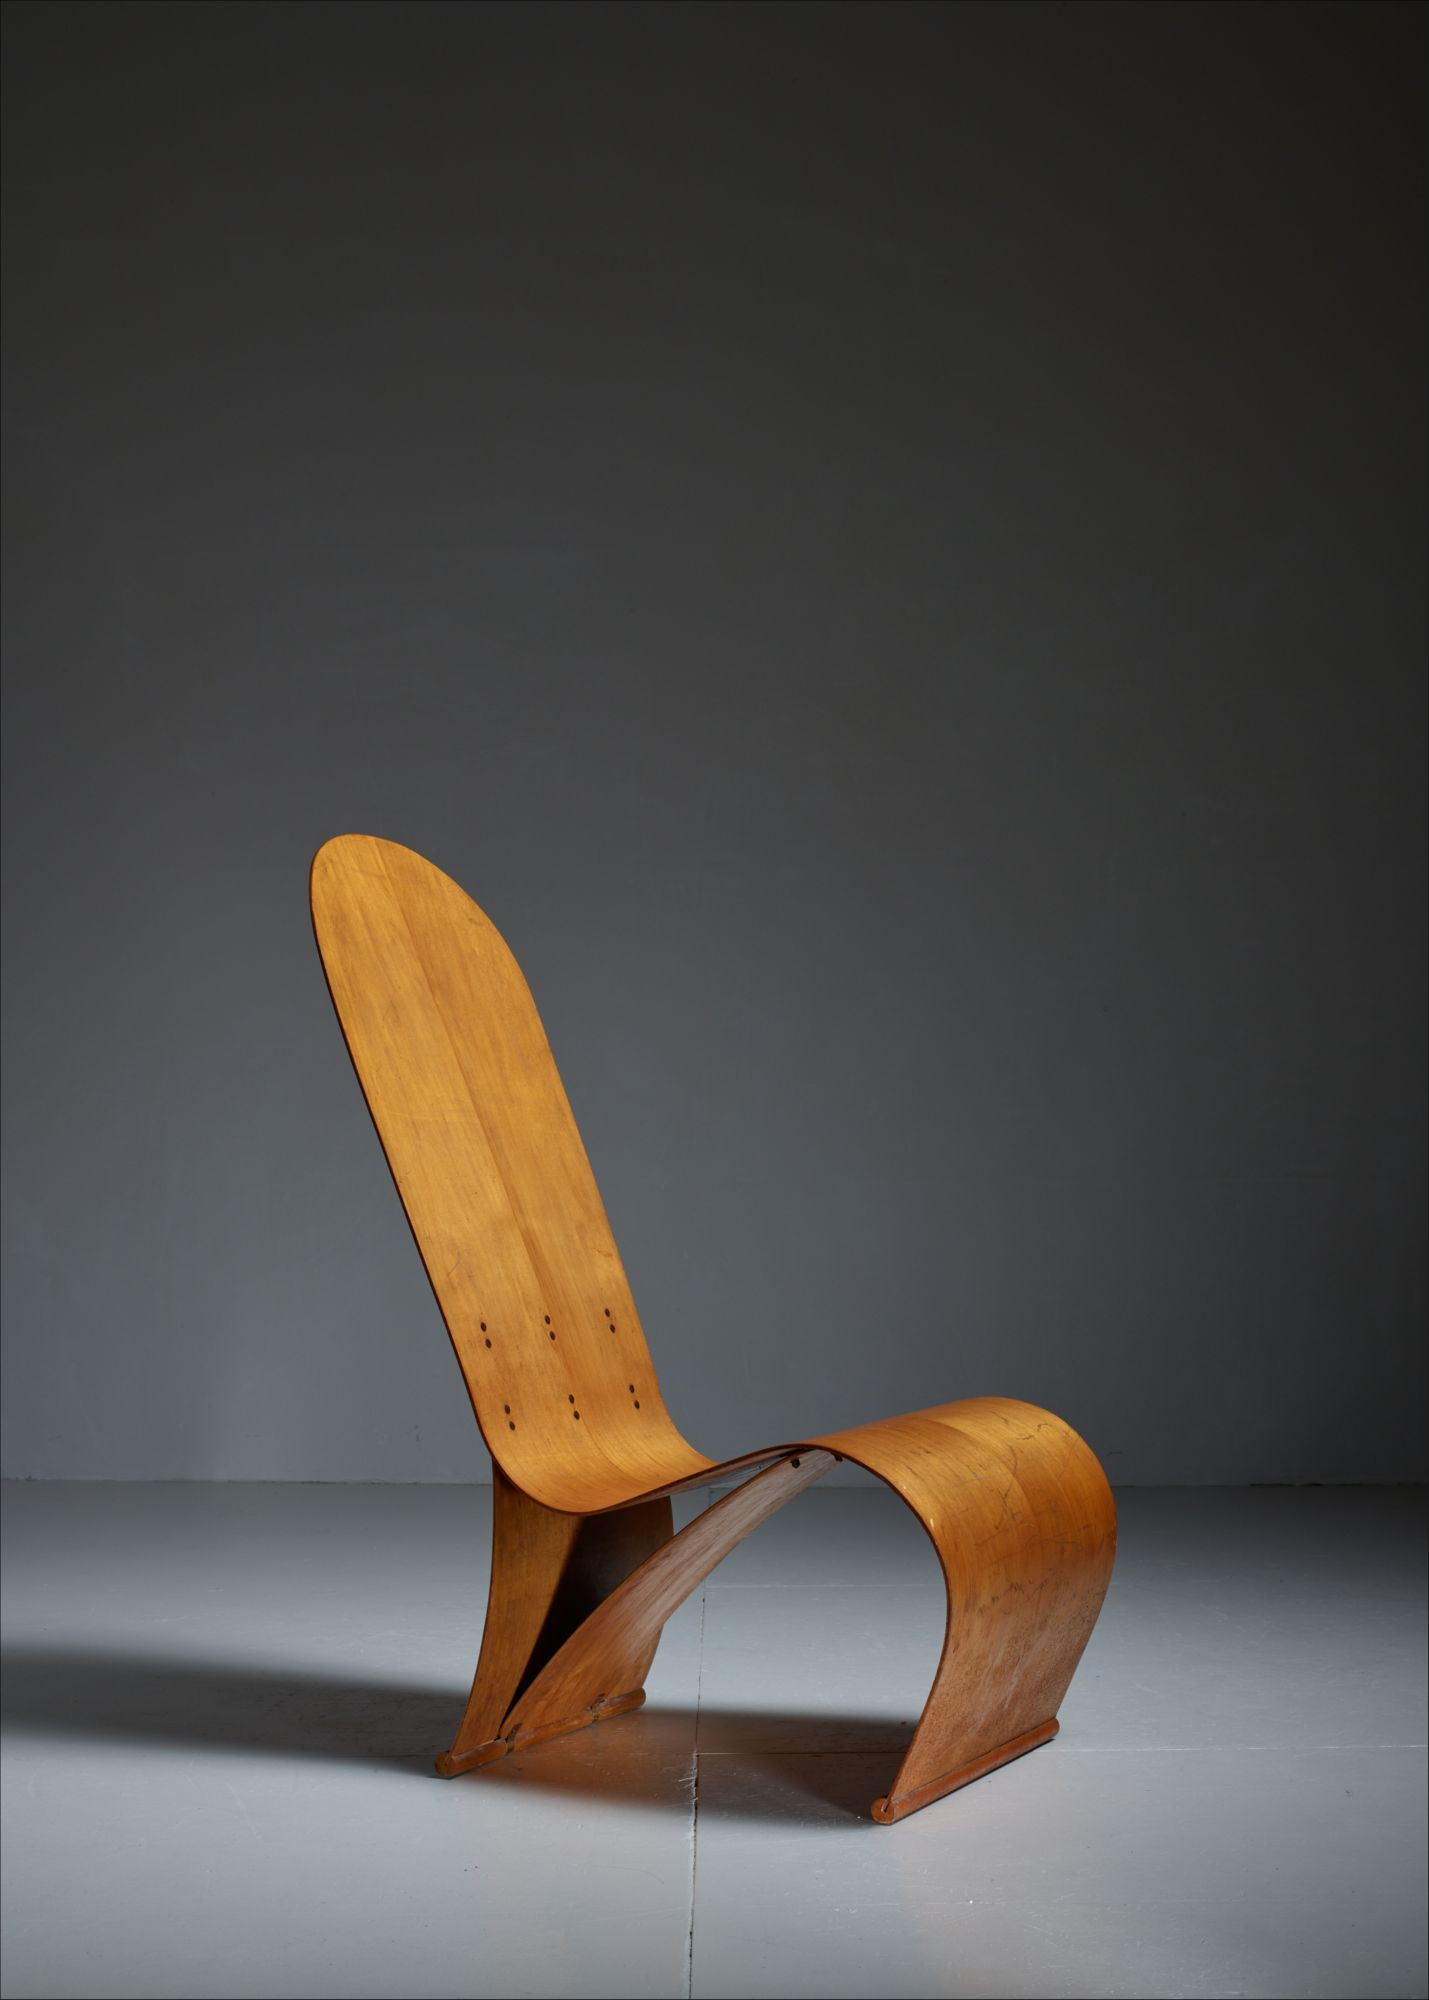 Stupendous Herbert Von Thaden Bent Plywood Lounge Chair Usa 1940S Andrewgaddart Wooden Chair Designs For Living Room Andrewgaddartcom